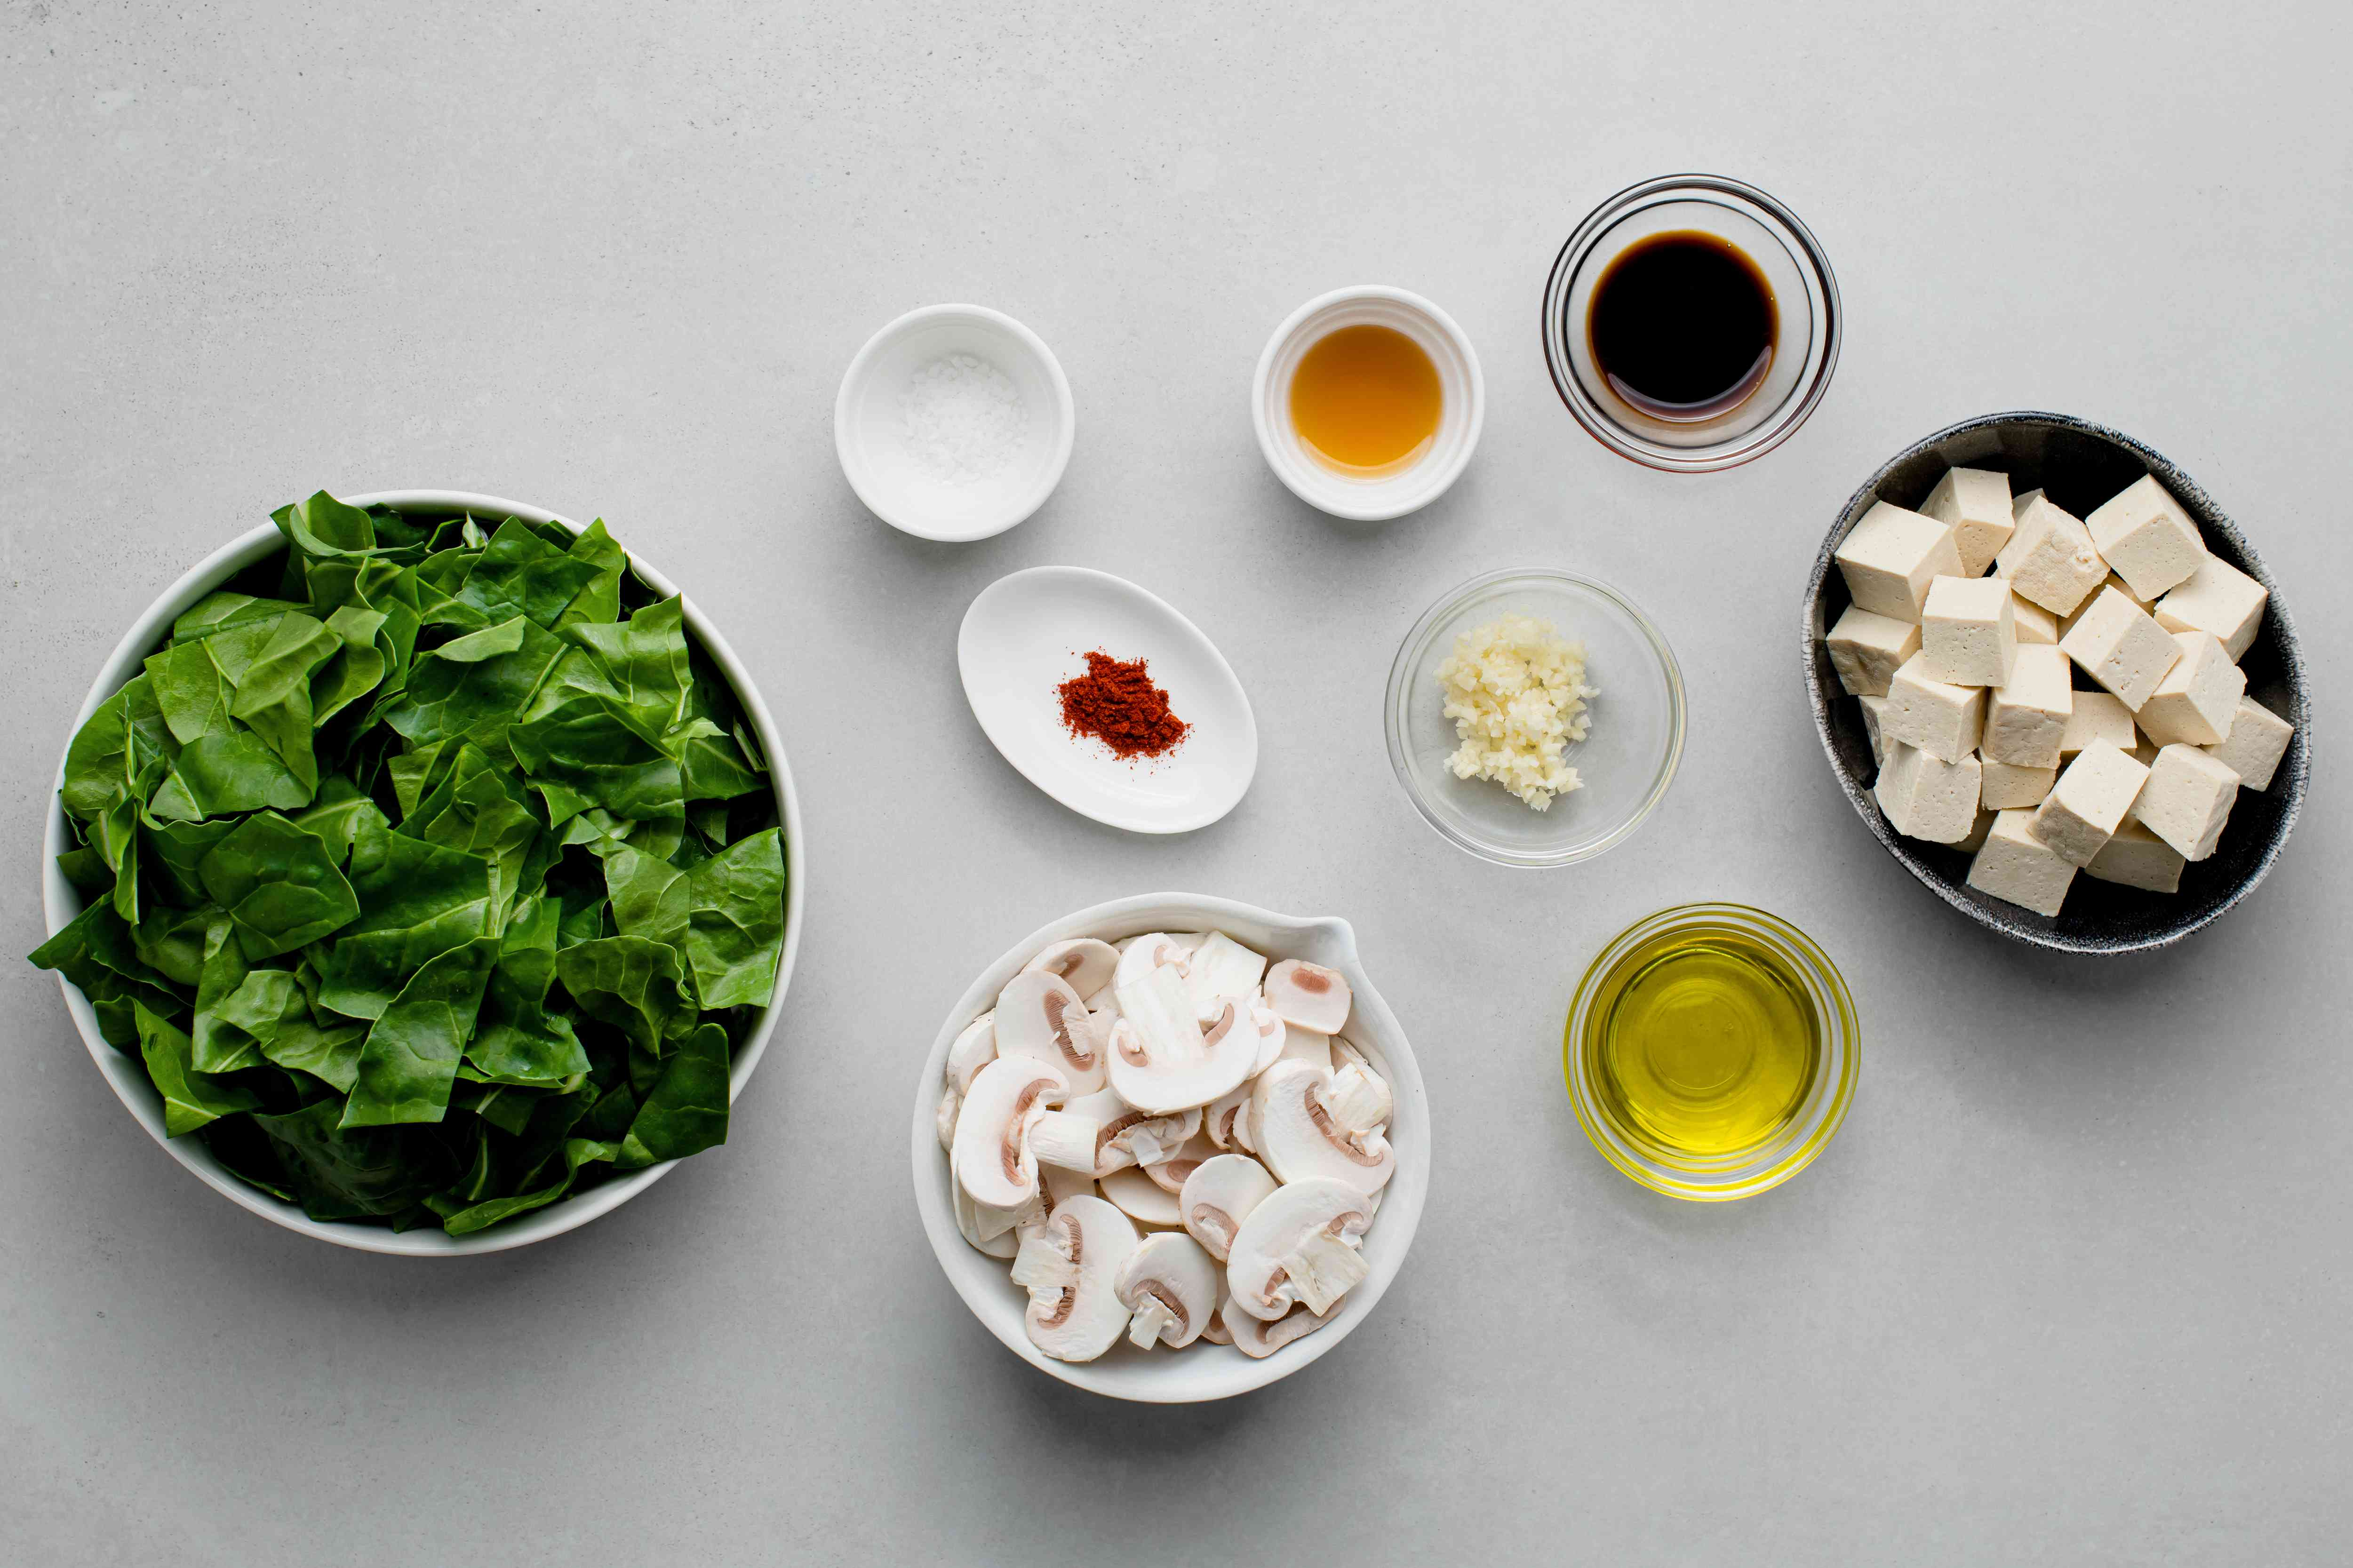 Swiss Chard and Tofu Stir-Fry ingredients